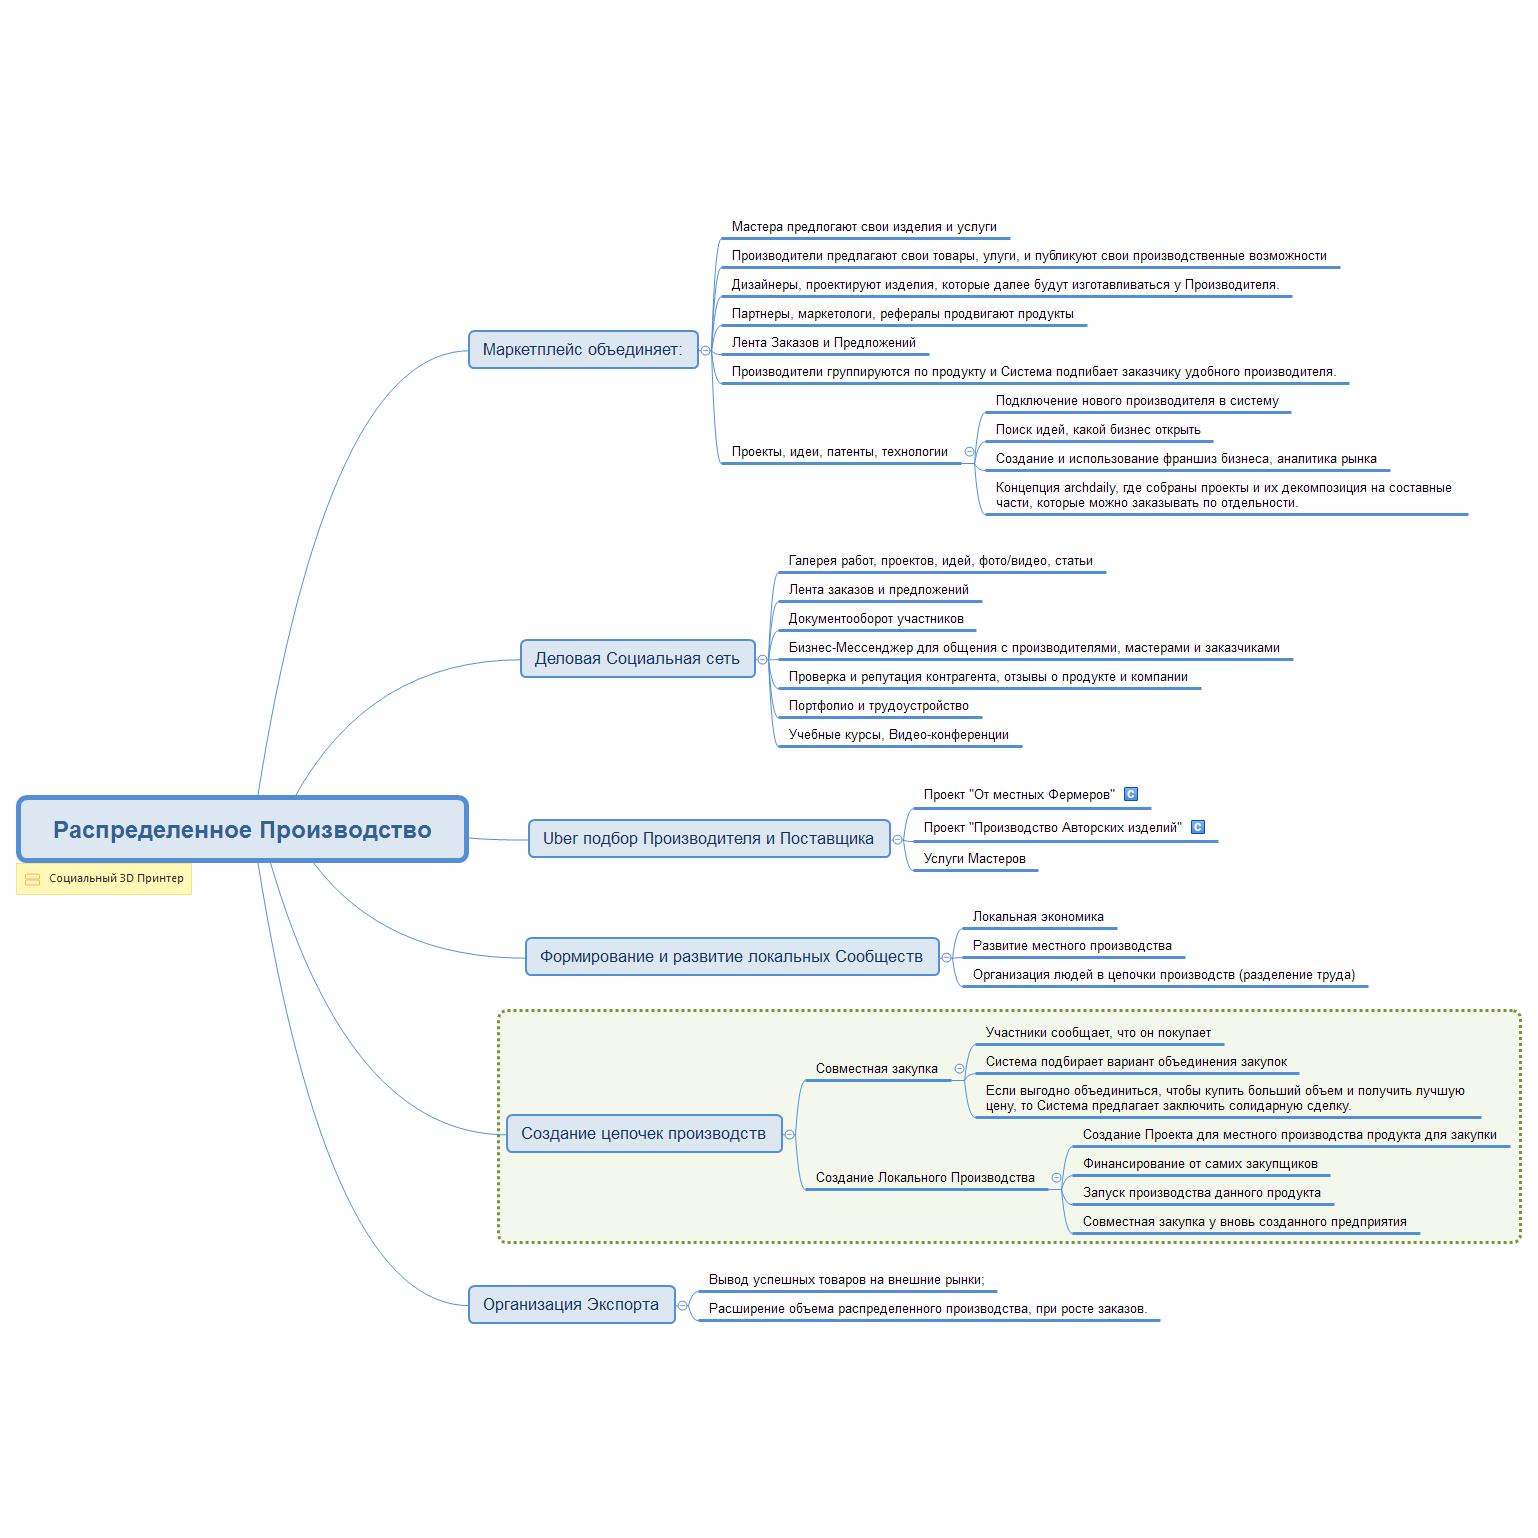 Система Распределенного Производства ProValue Industry